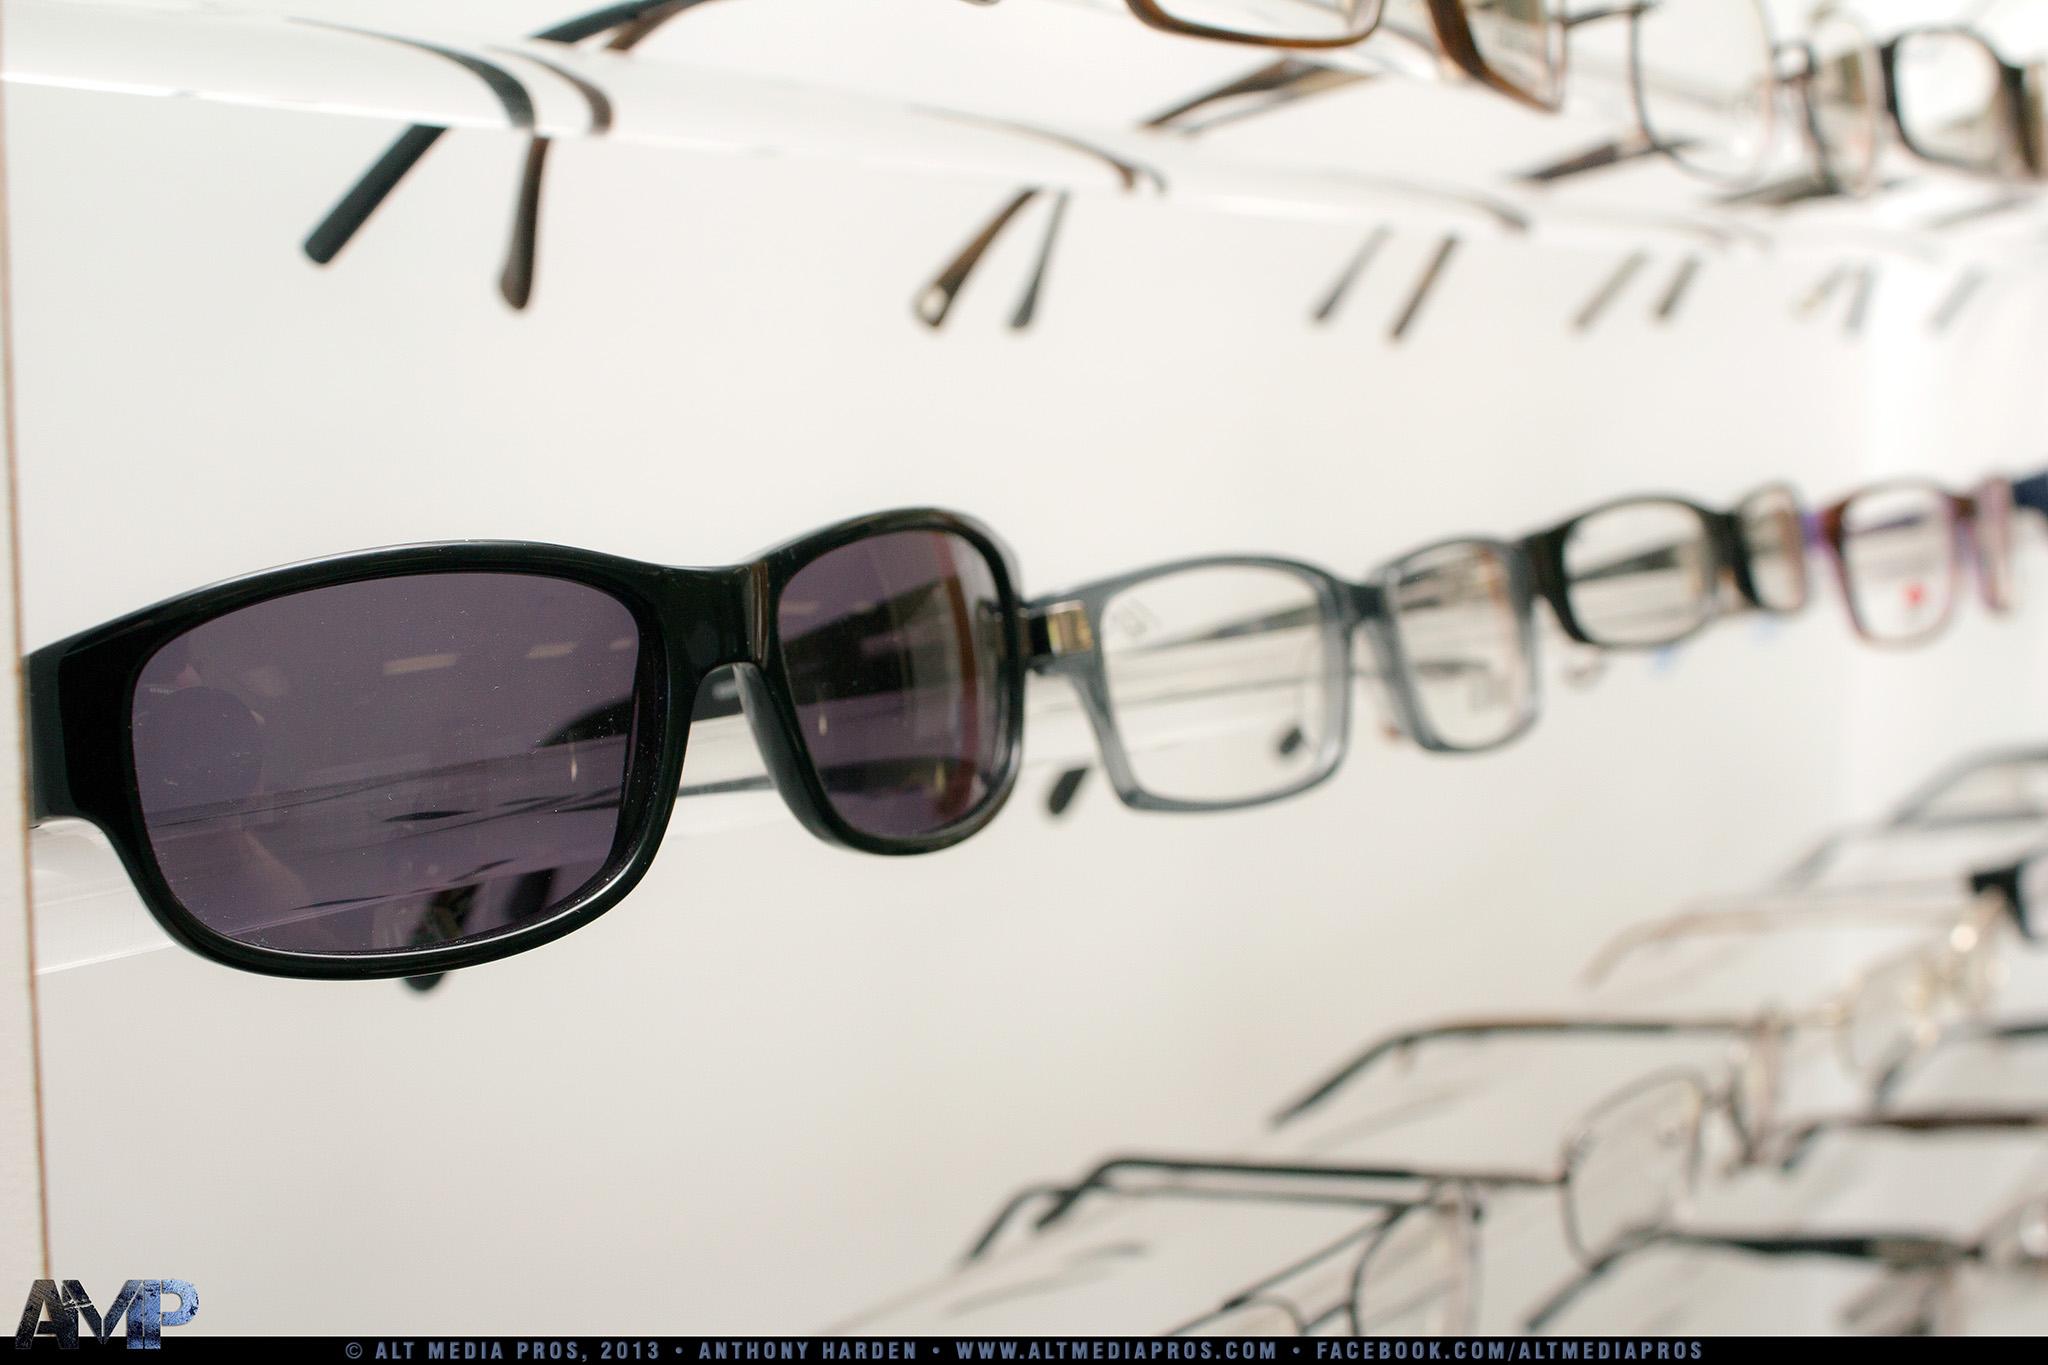 The Optical Shoppe_AMP_043013_014.jpg